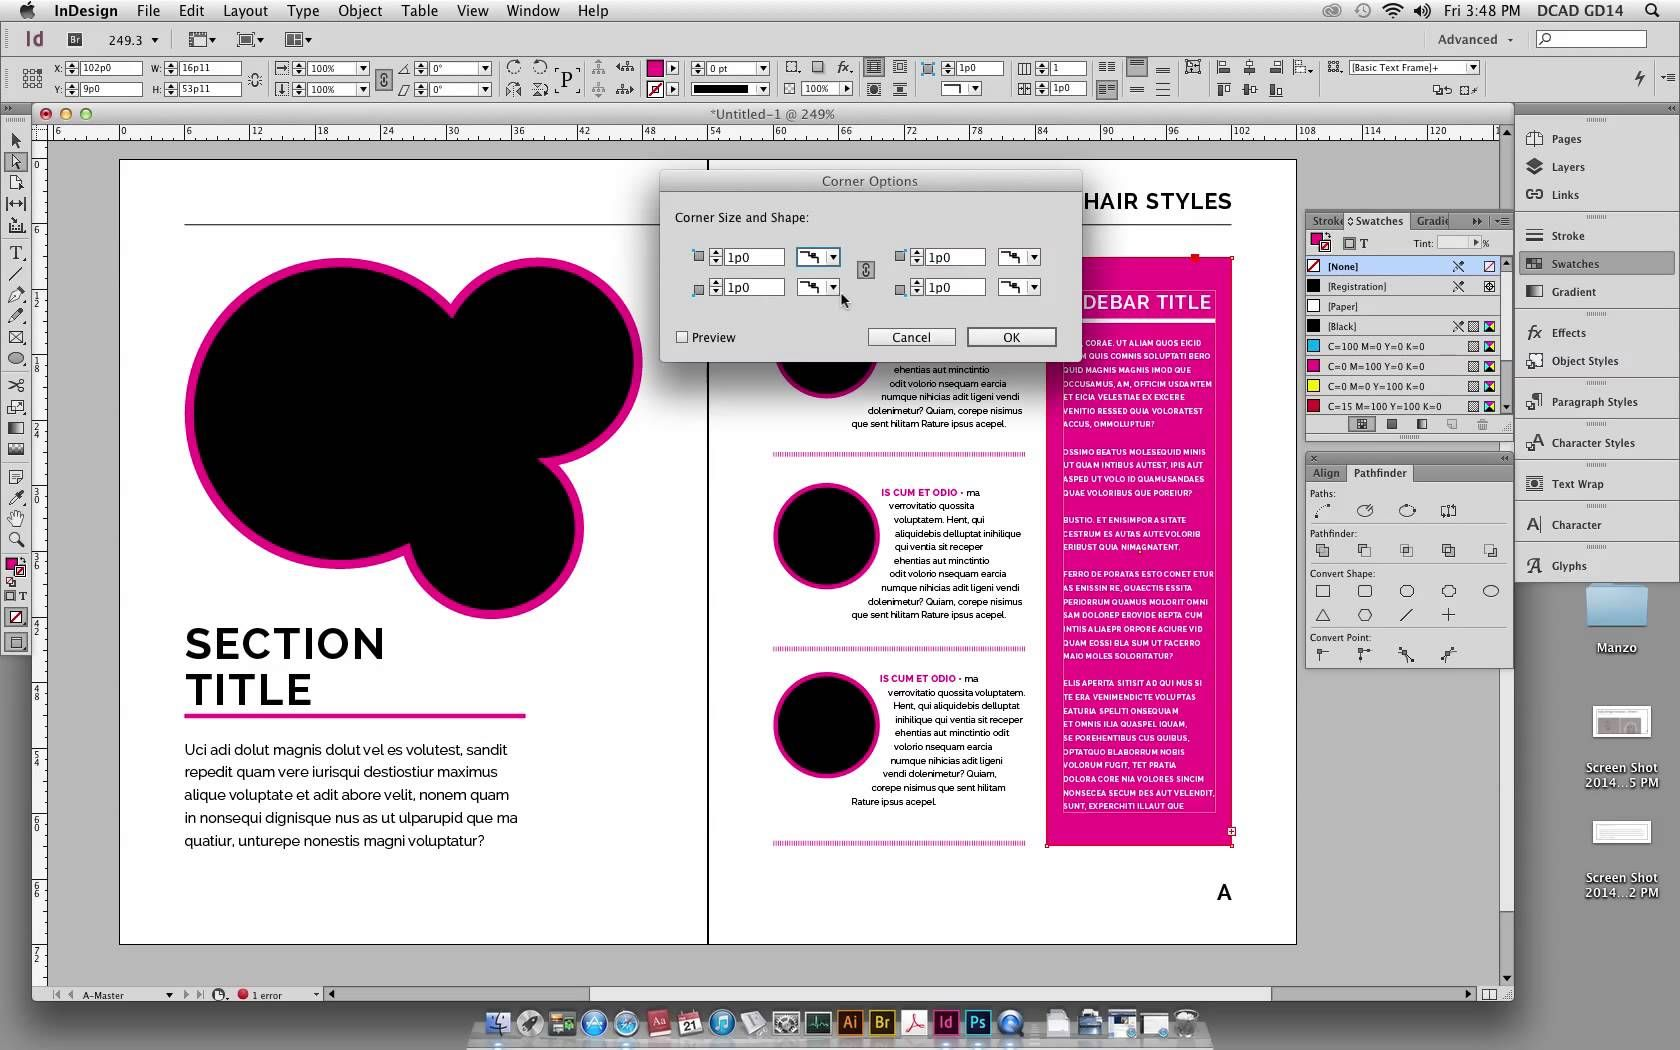 Tutorial Indesign Book Setup Indesign Tutorials Adobe Indesign Tutorials Workbook Design